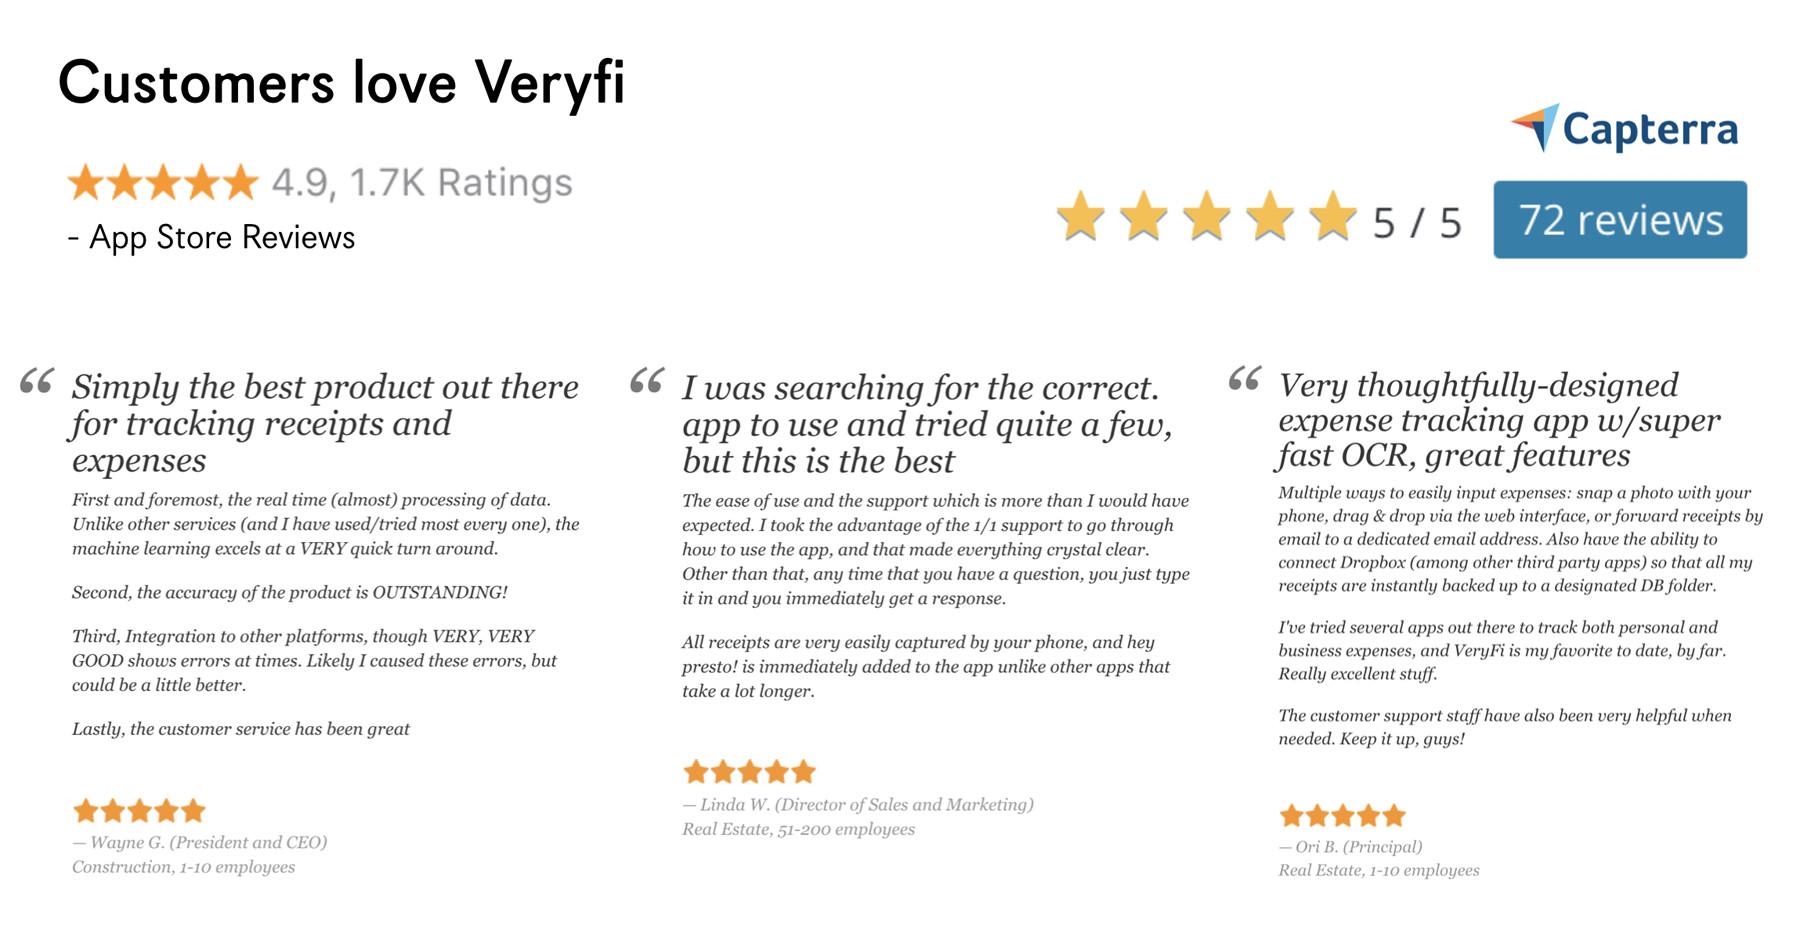 Customers Love Veryfi -- Read Veryfi's Capterra Reviews and App Store Reviews